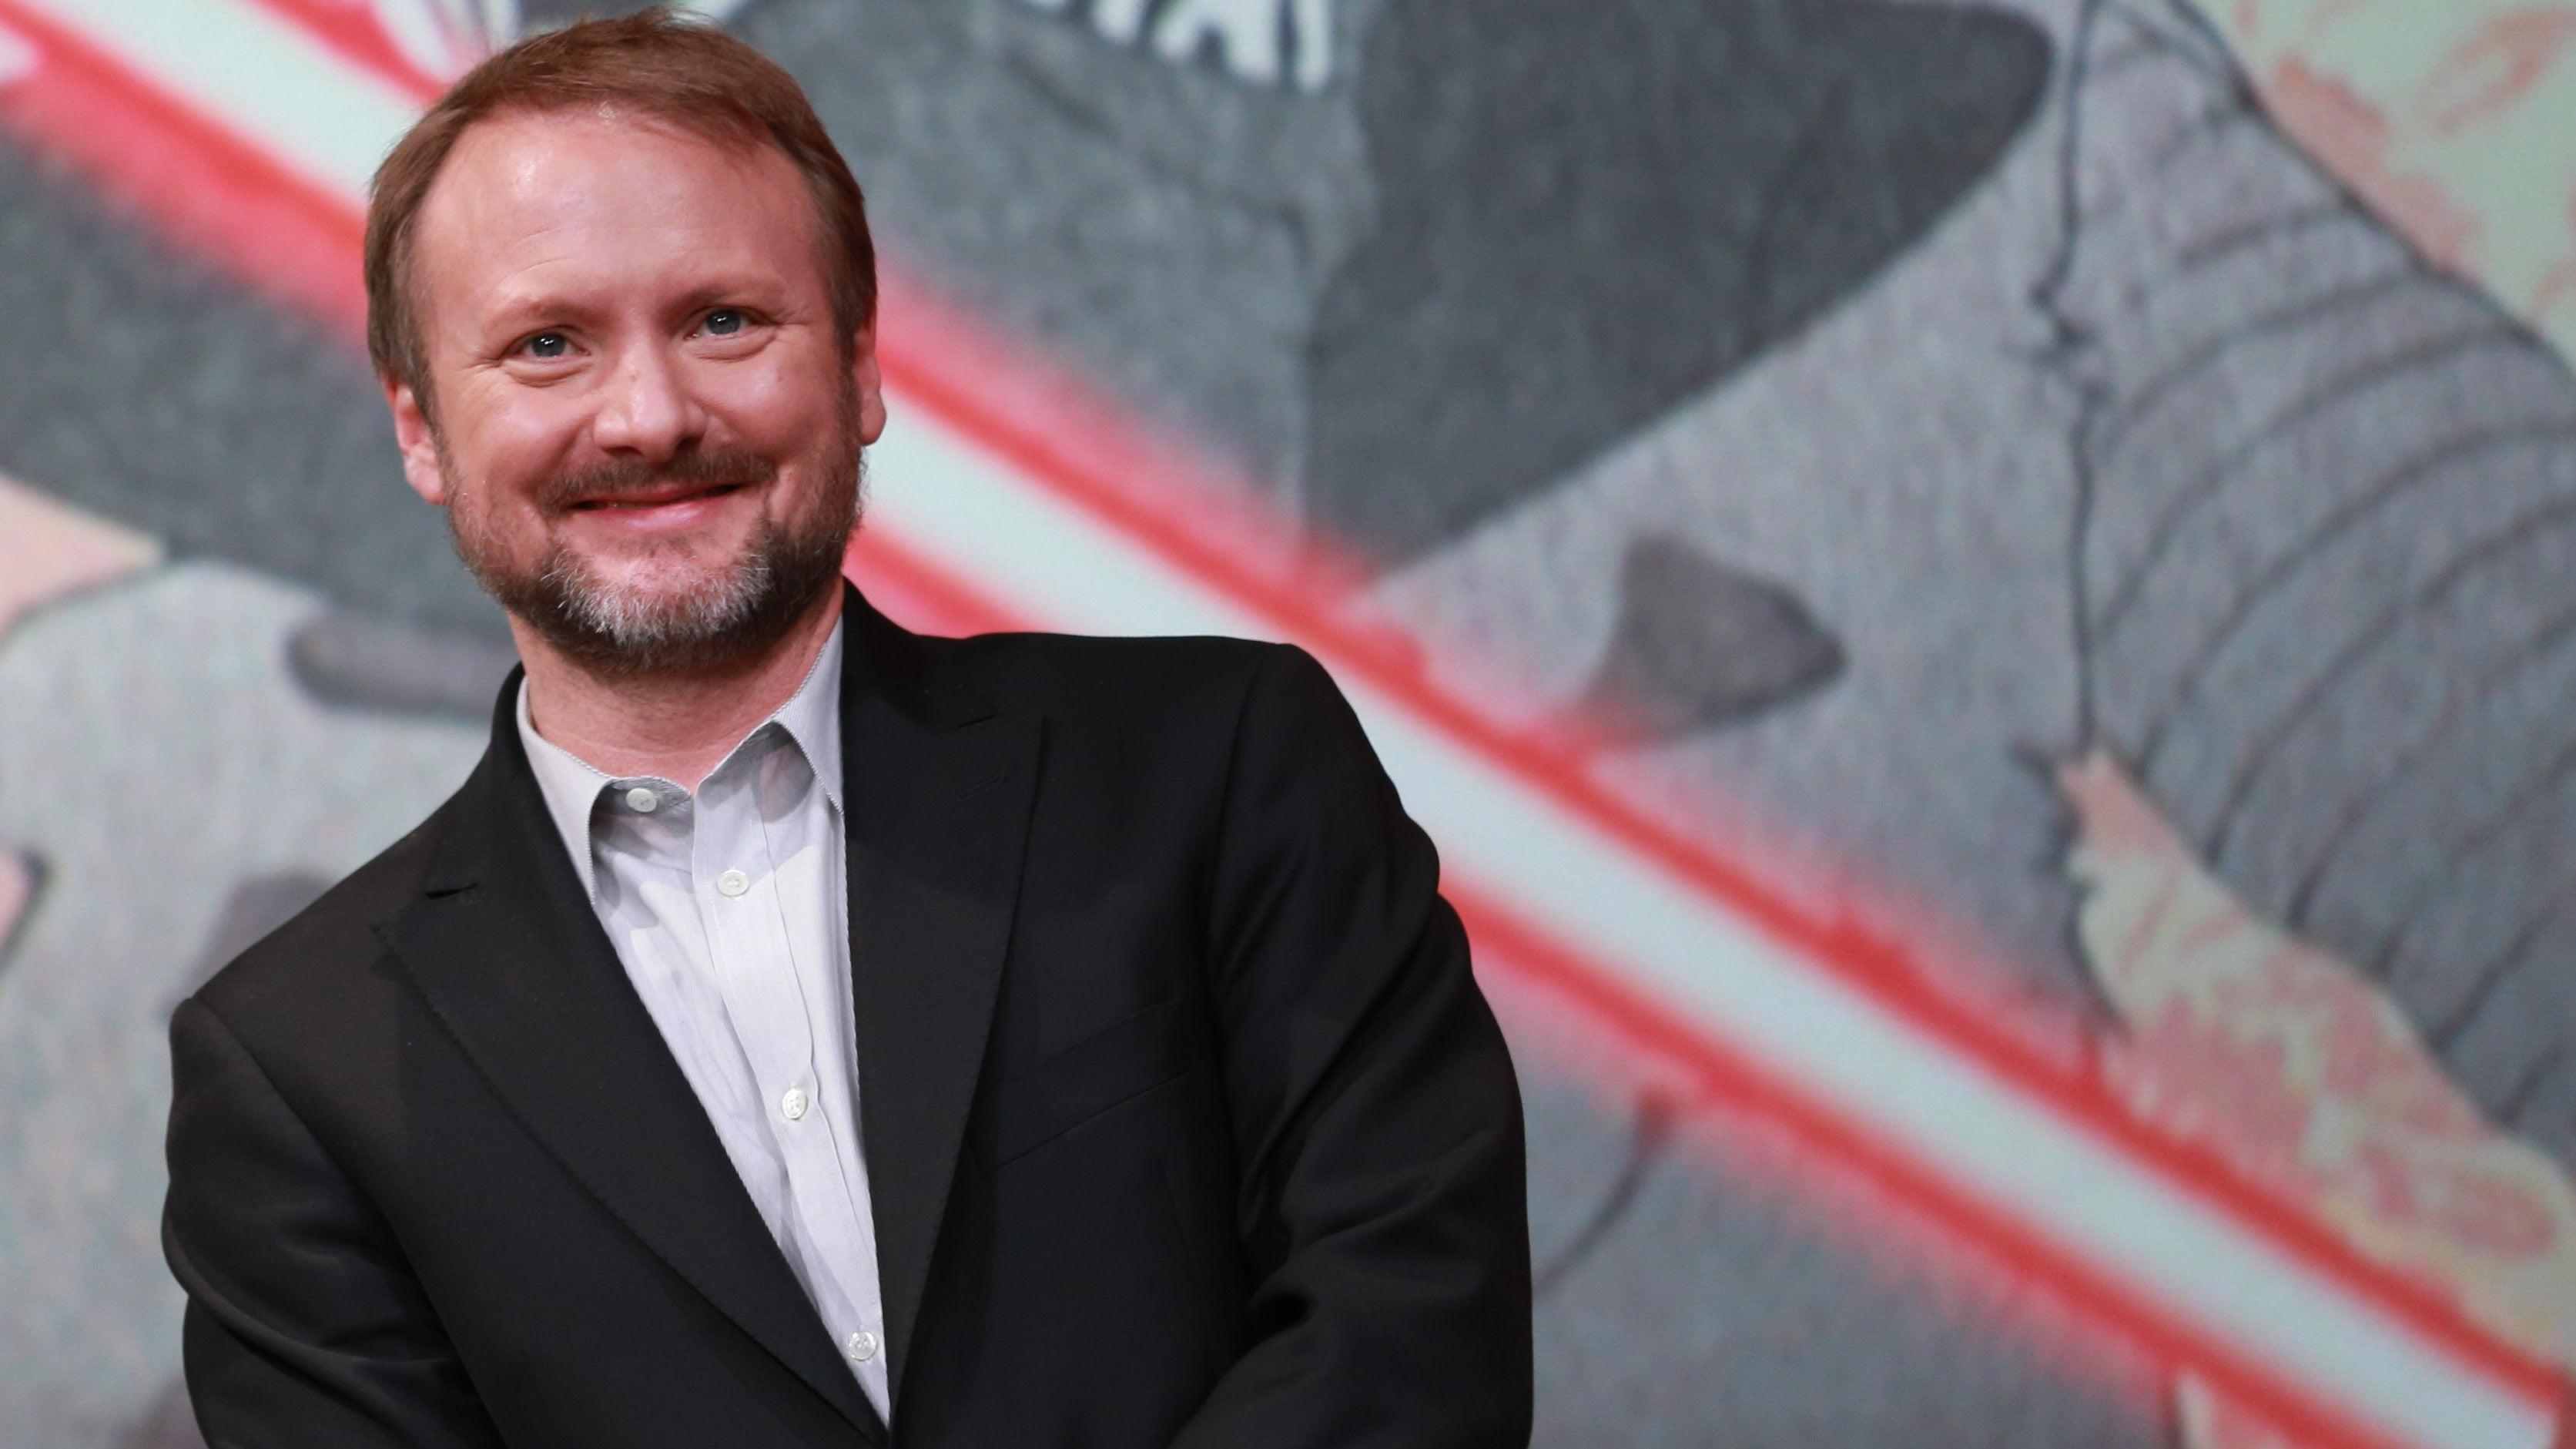 The Baby Yoda Vs. Porg Debate Is Settled Thanks To Rian Johnson